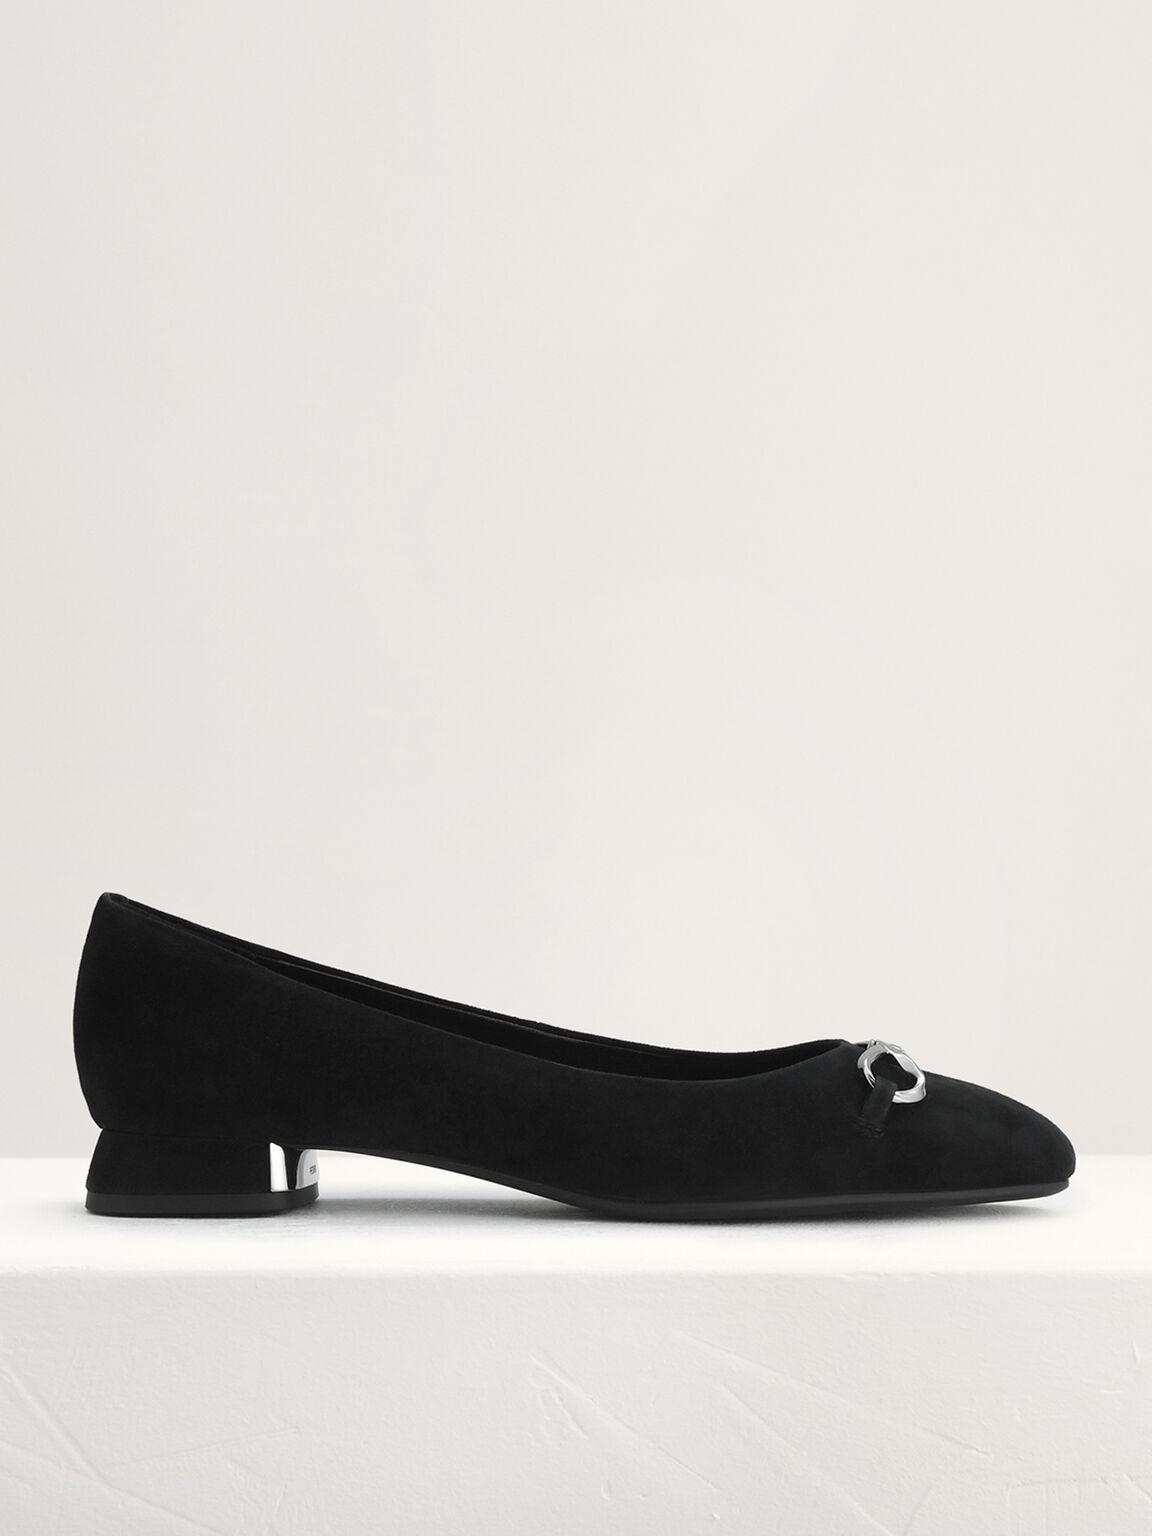 Suede Leather Ballerina Flats, Black, hi-res